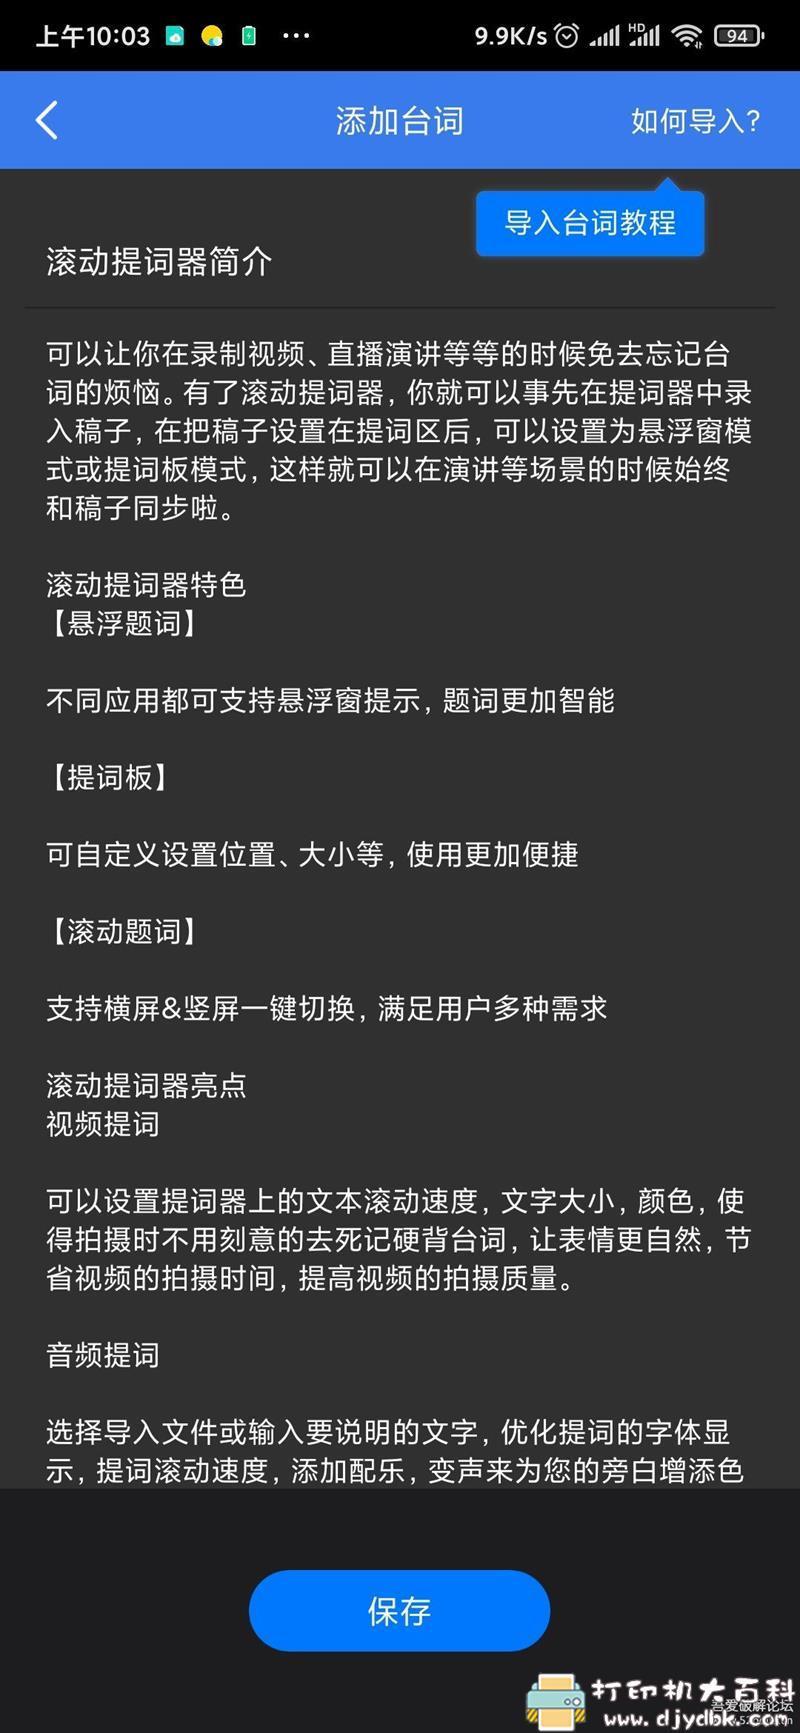 [Android]超好用的手机提词器:滚动提词器V1.00 配图 No.2